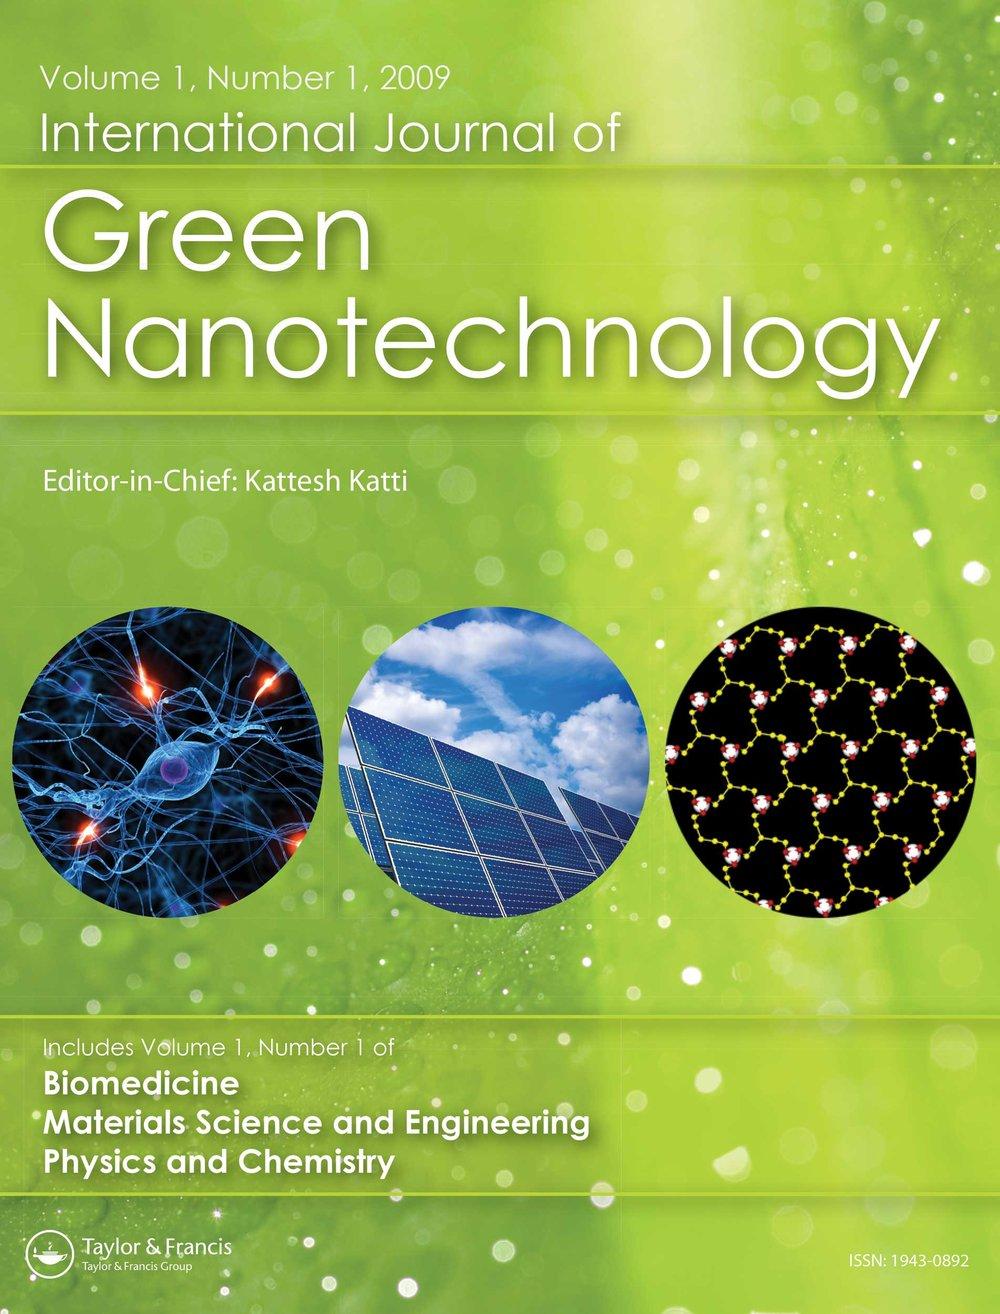 Green-Nanotech_2009.jpg